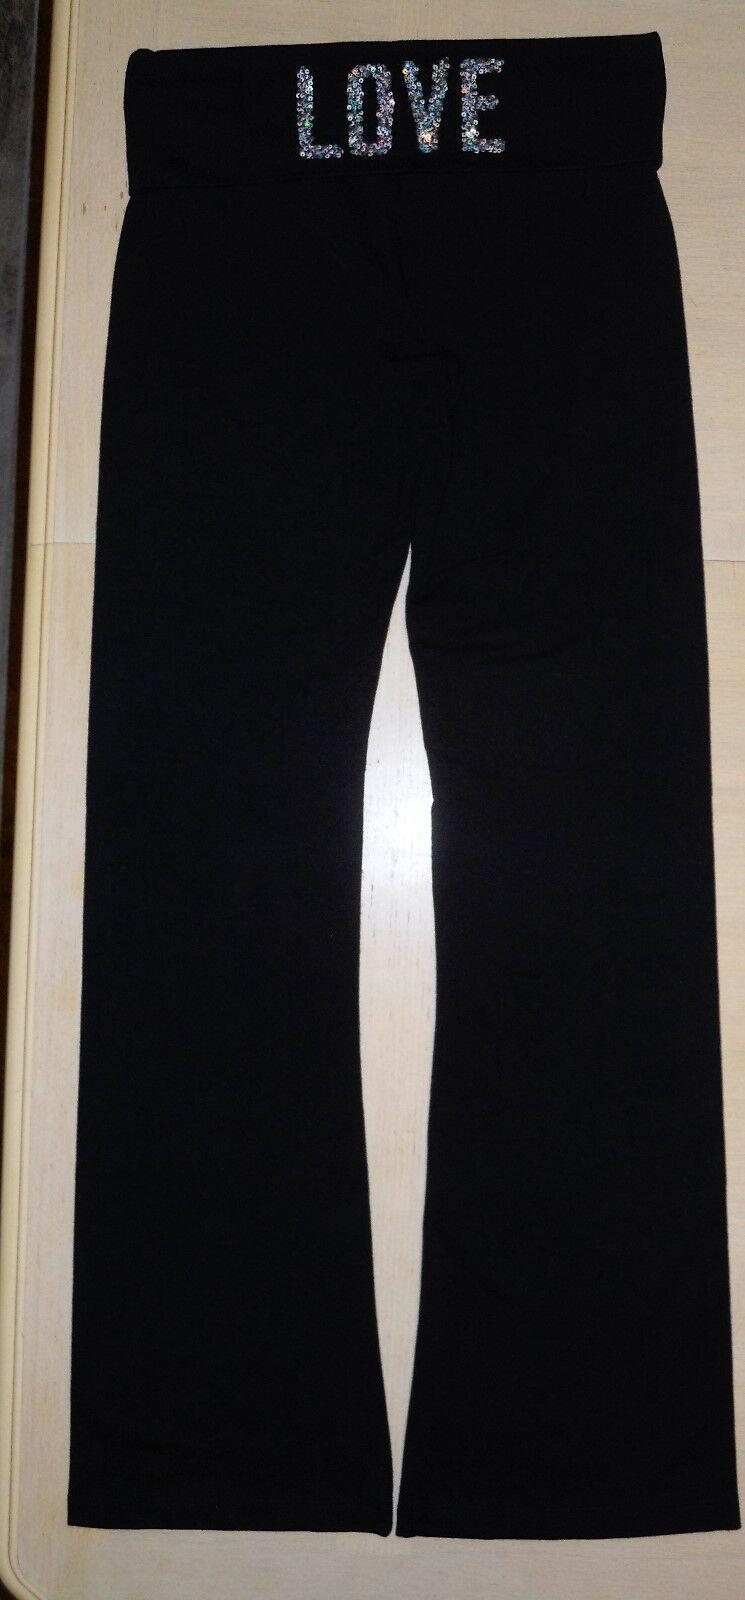 Victorias Secret Yoga Pant Fold Down Waist Bling Small Regular